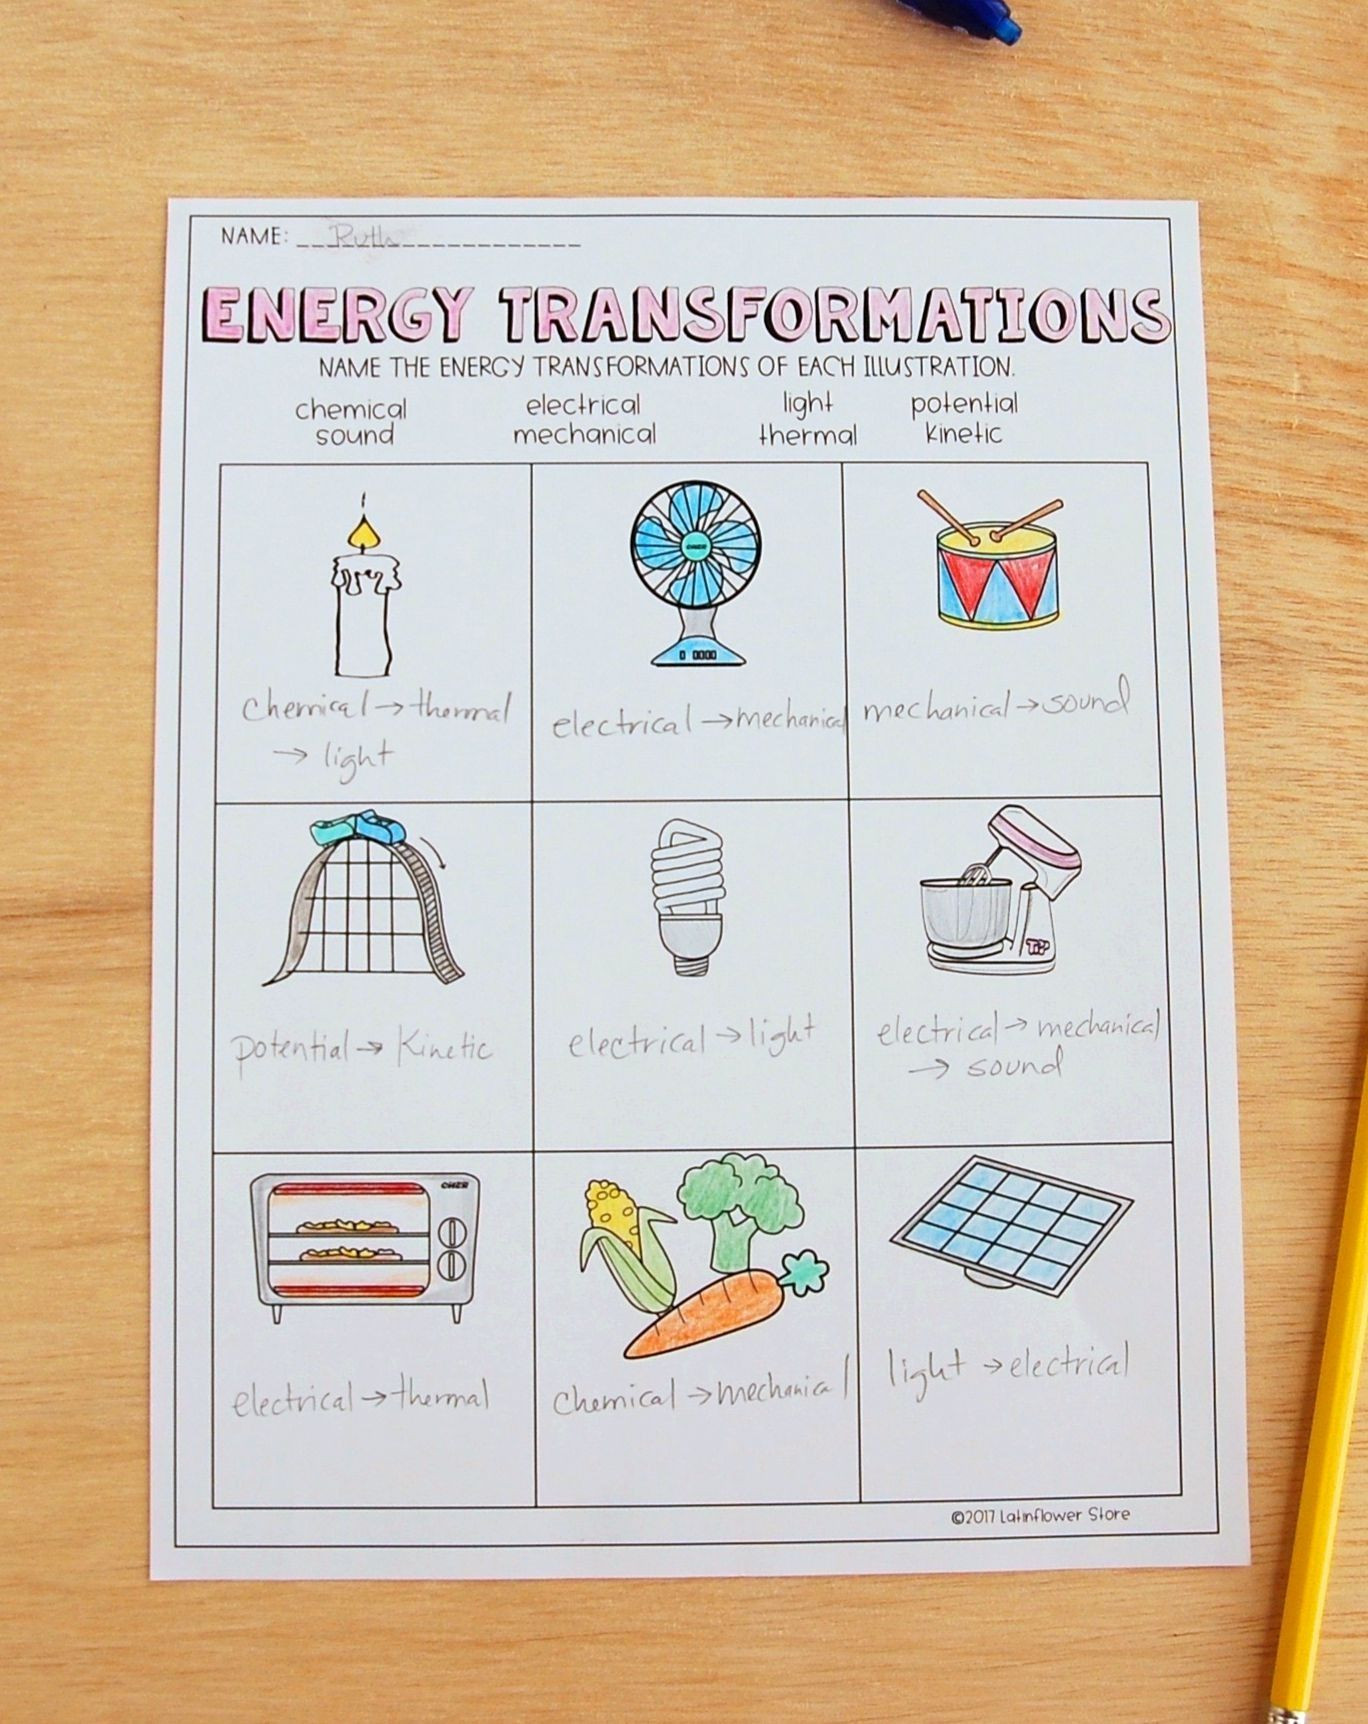 Energy Transformation Worksheet Answer Key Energy Transformations Worksheet